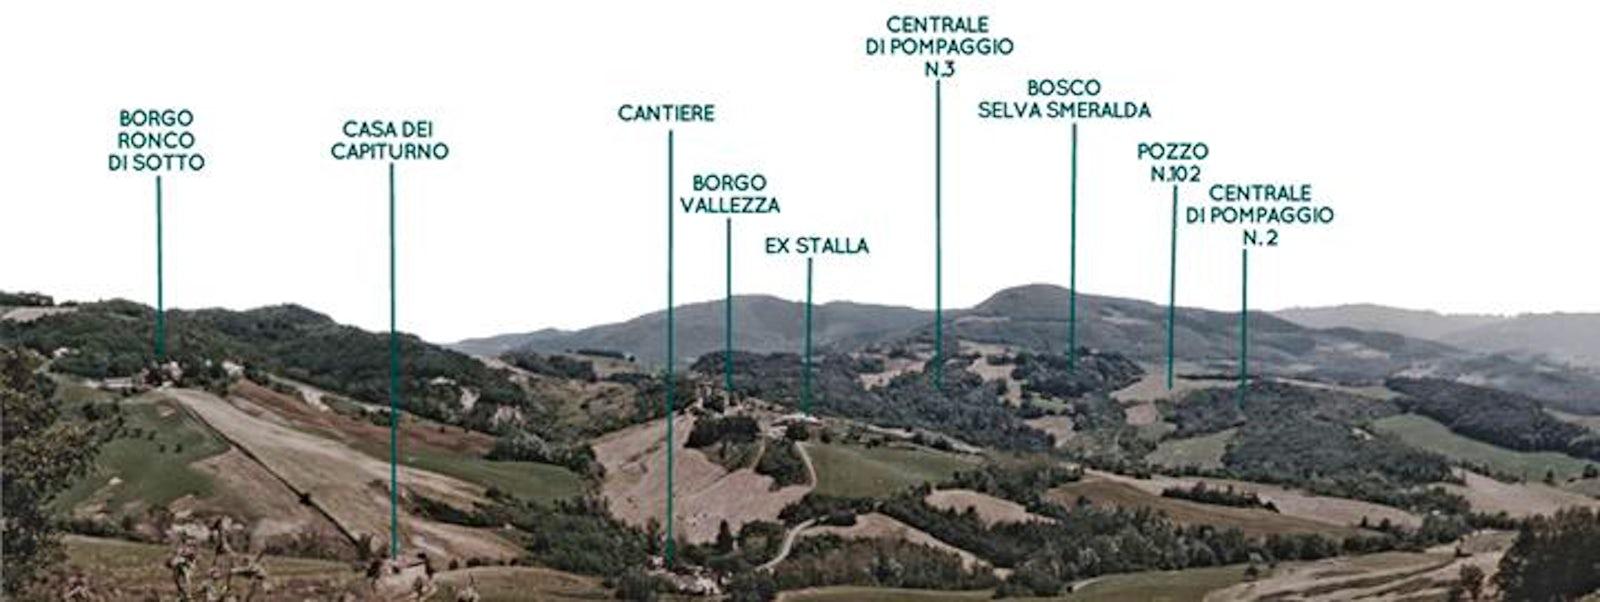 Travel inspired - Location - Mu.Pe. Parco Museo del Petrolio   itinari